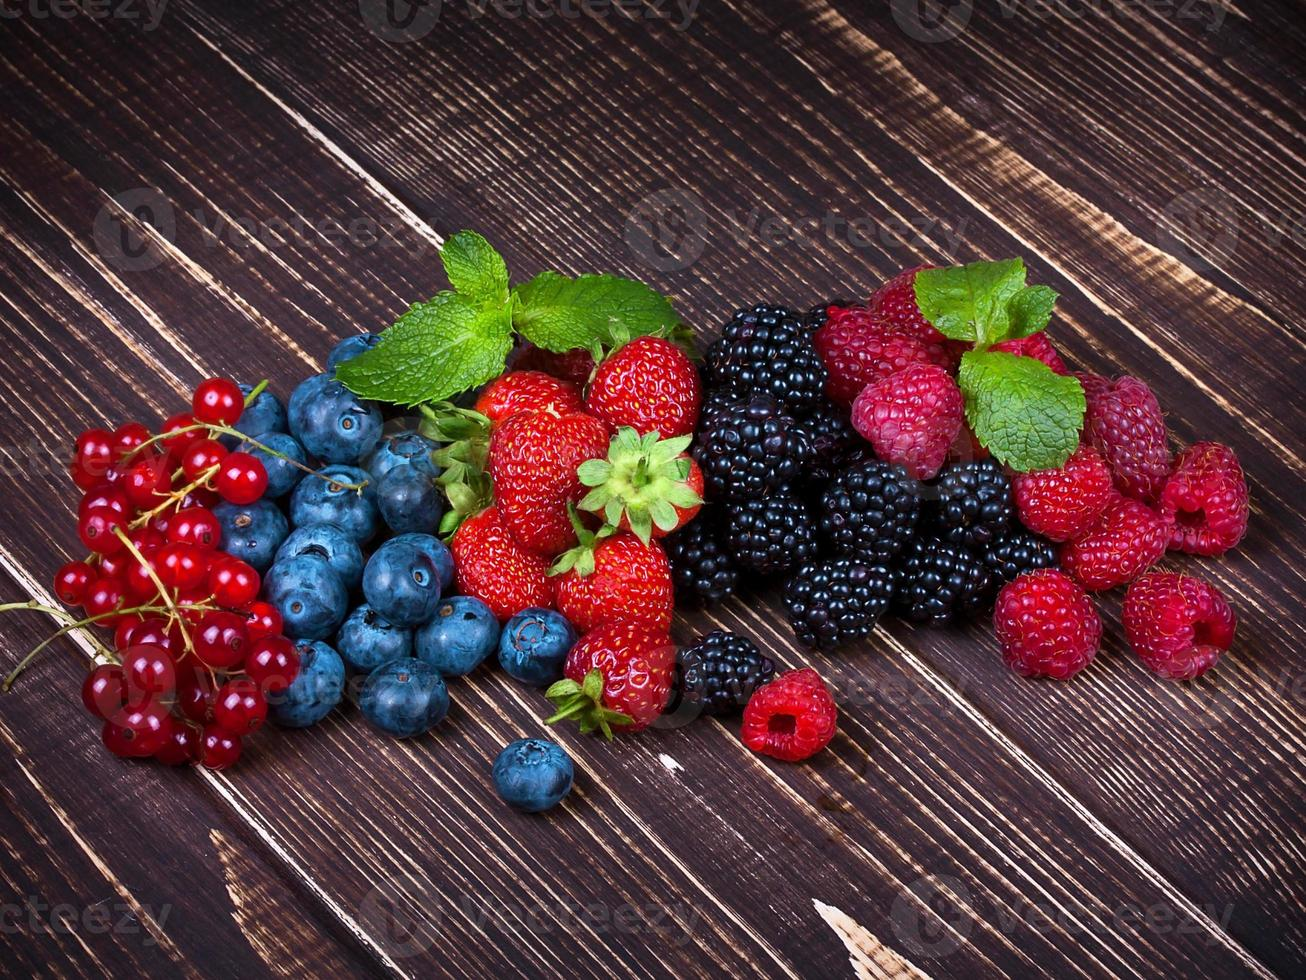 aardbeien, bosbessen, bramen, frambozen en bessen foto